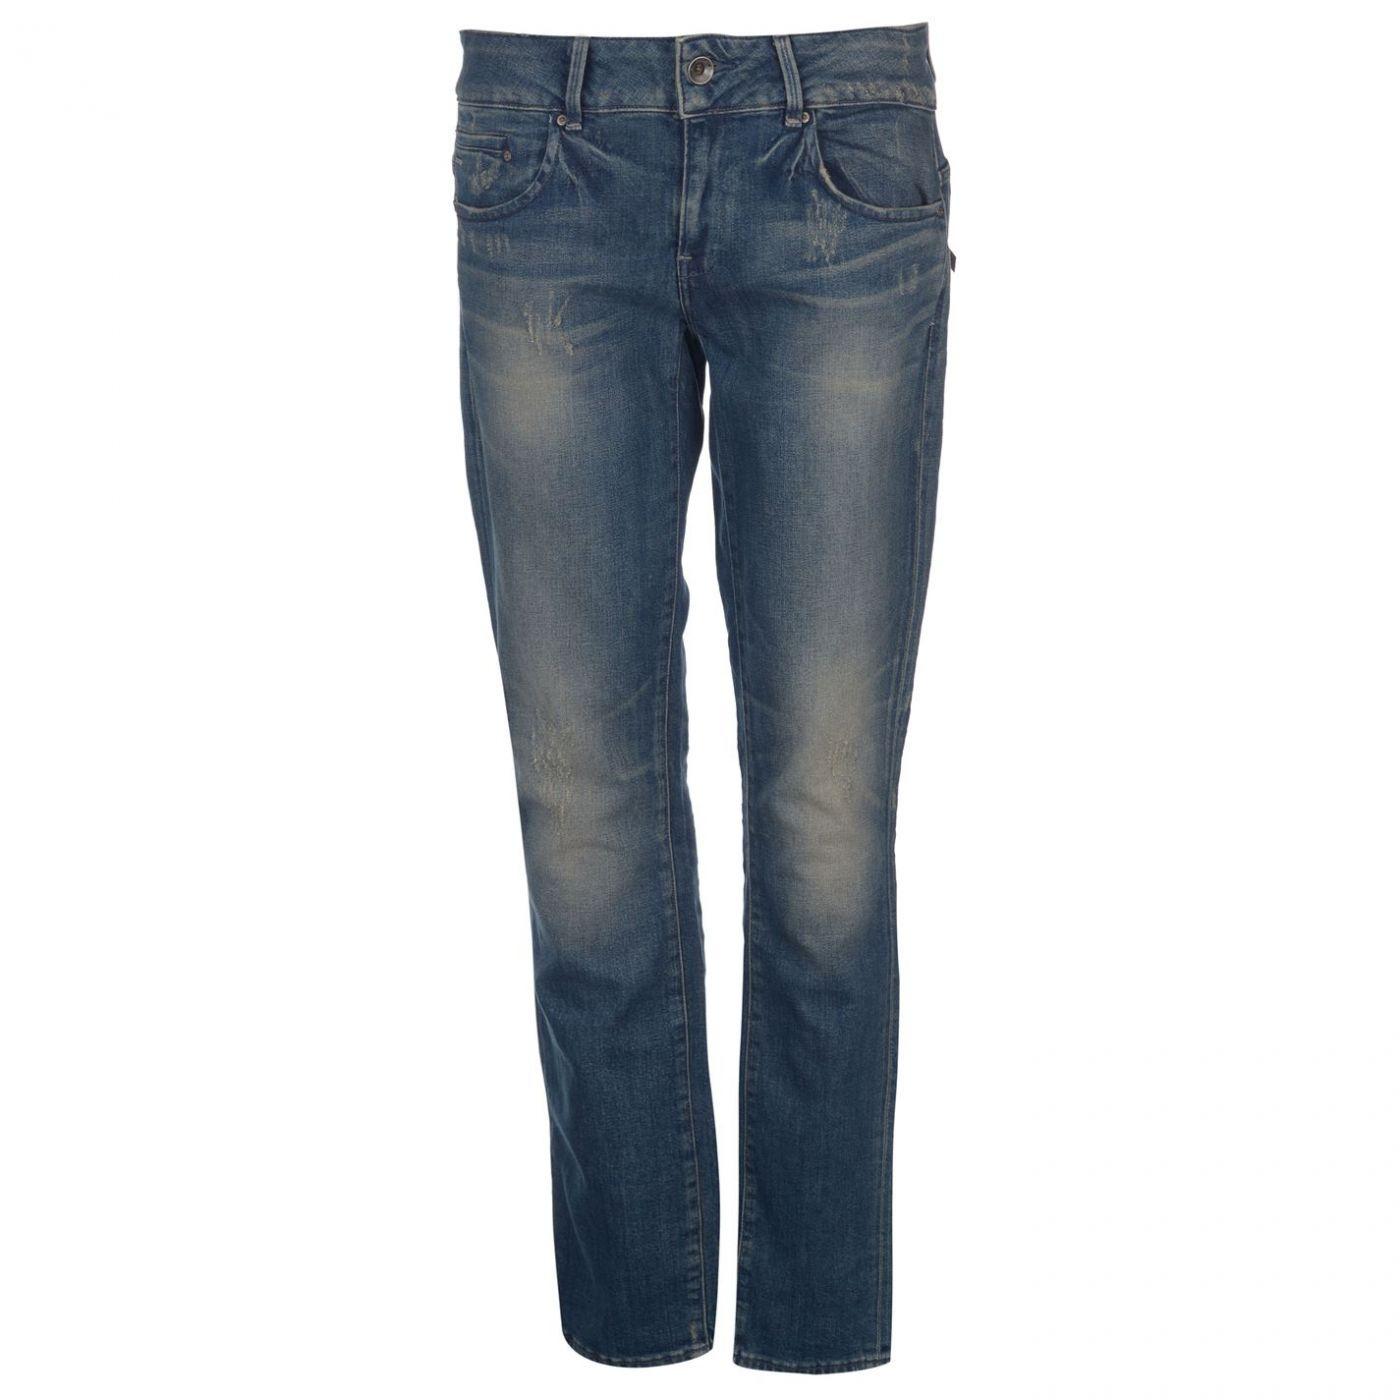 G Star 60883 Skinny Jeans